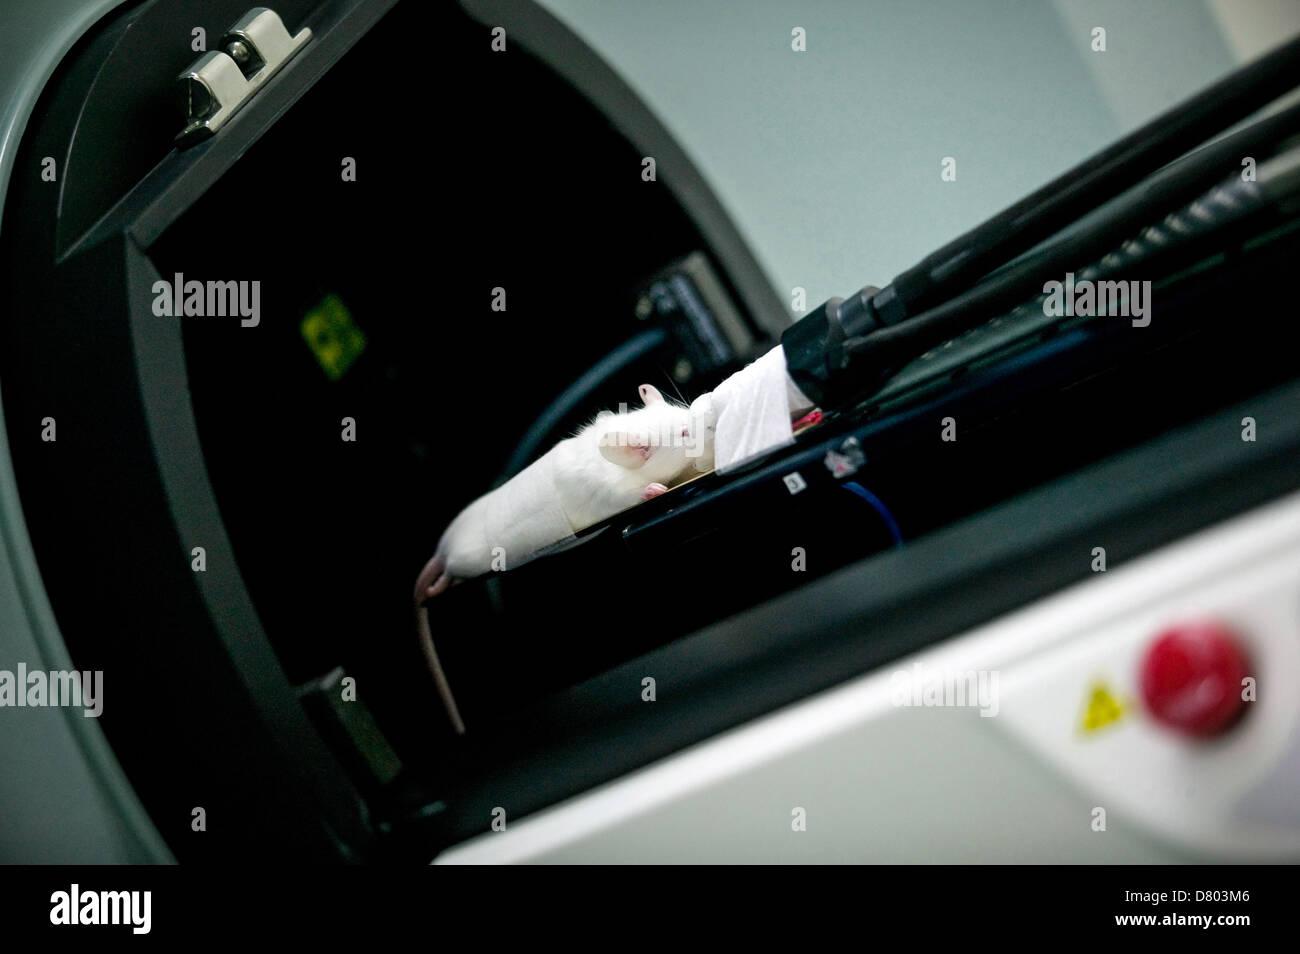 CT Imaging room machine - Stock Image